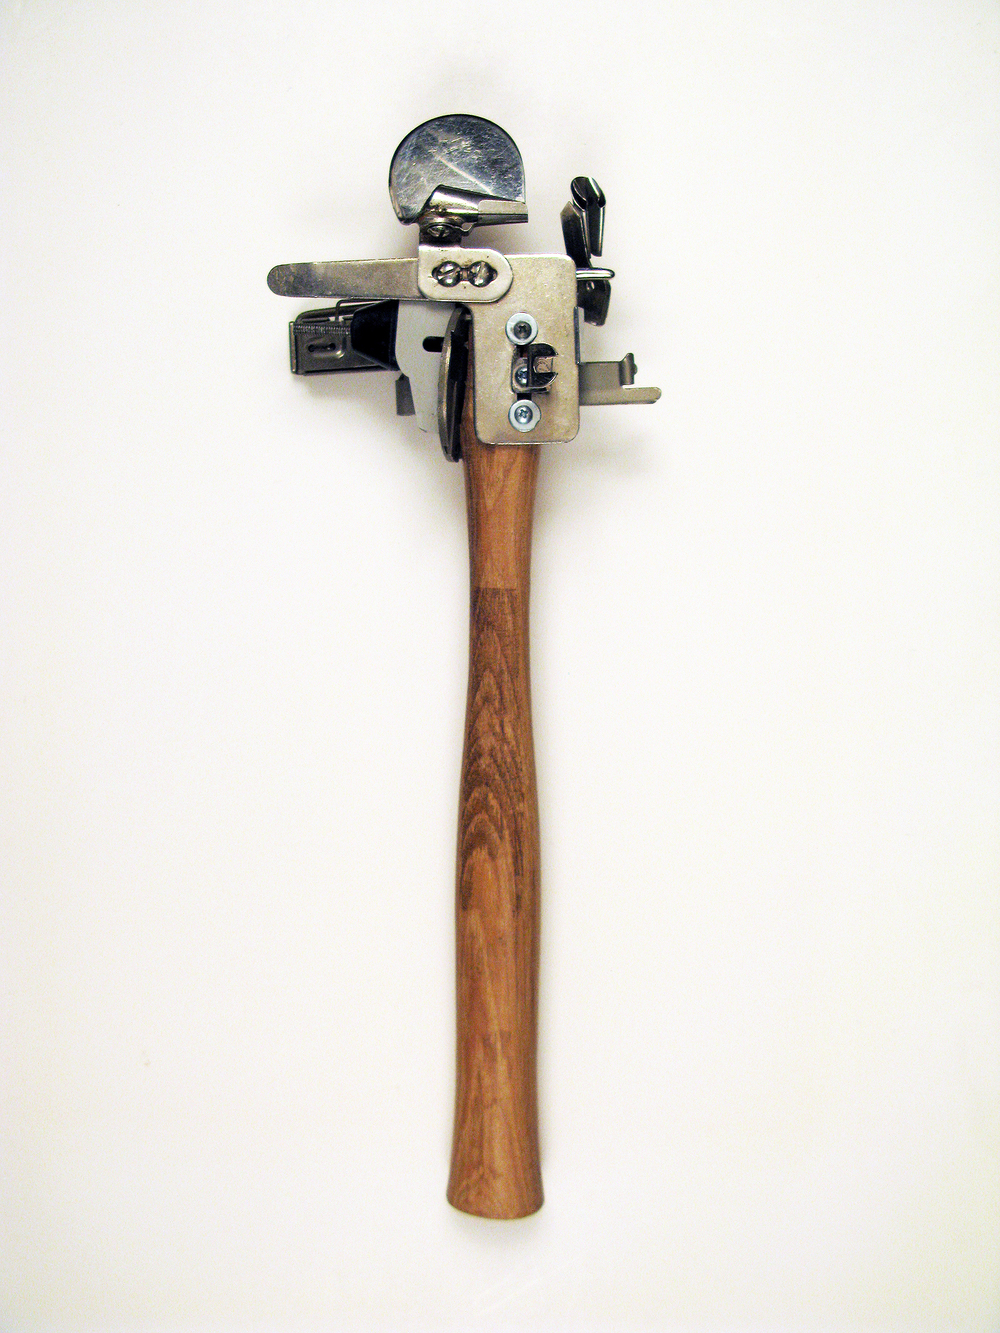 Modern Hammer Sew Machine.jpg